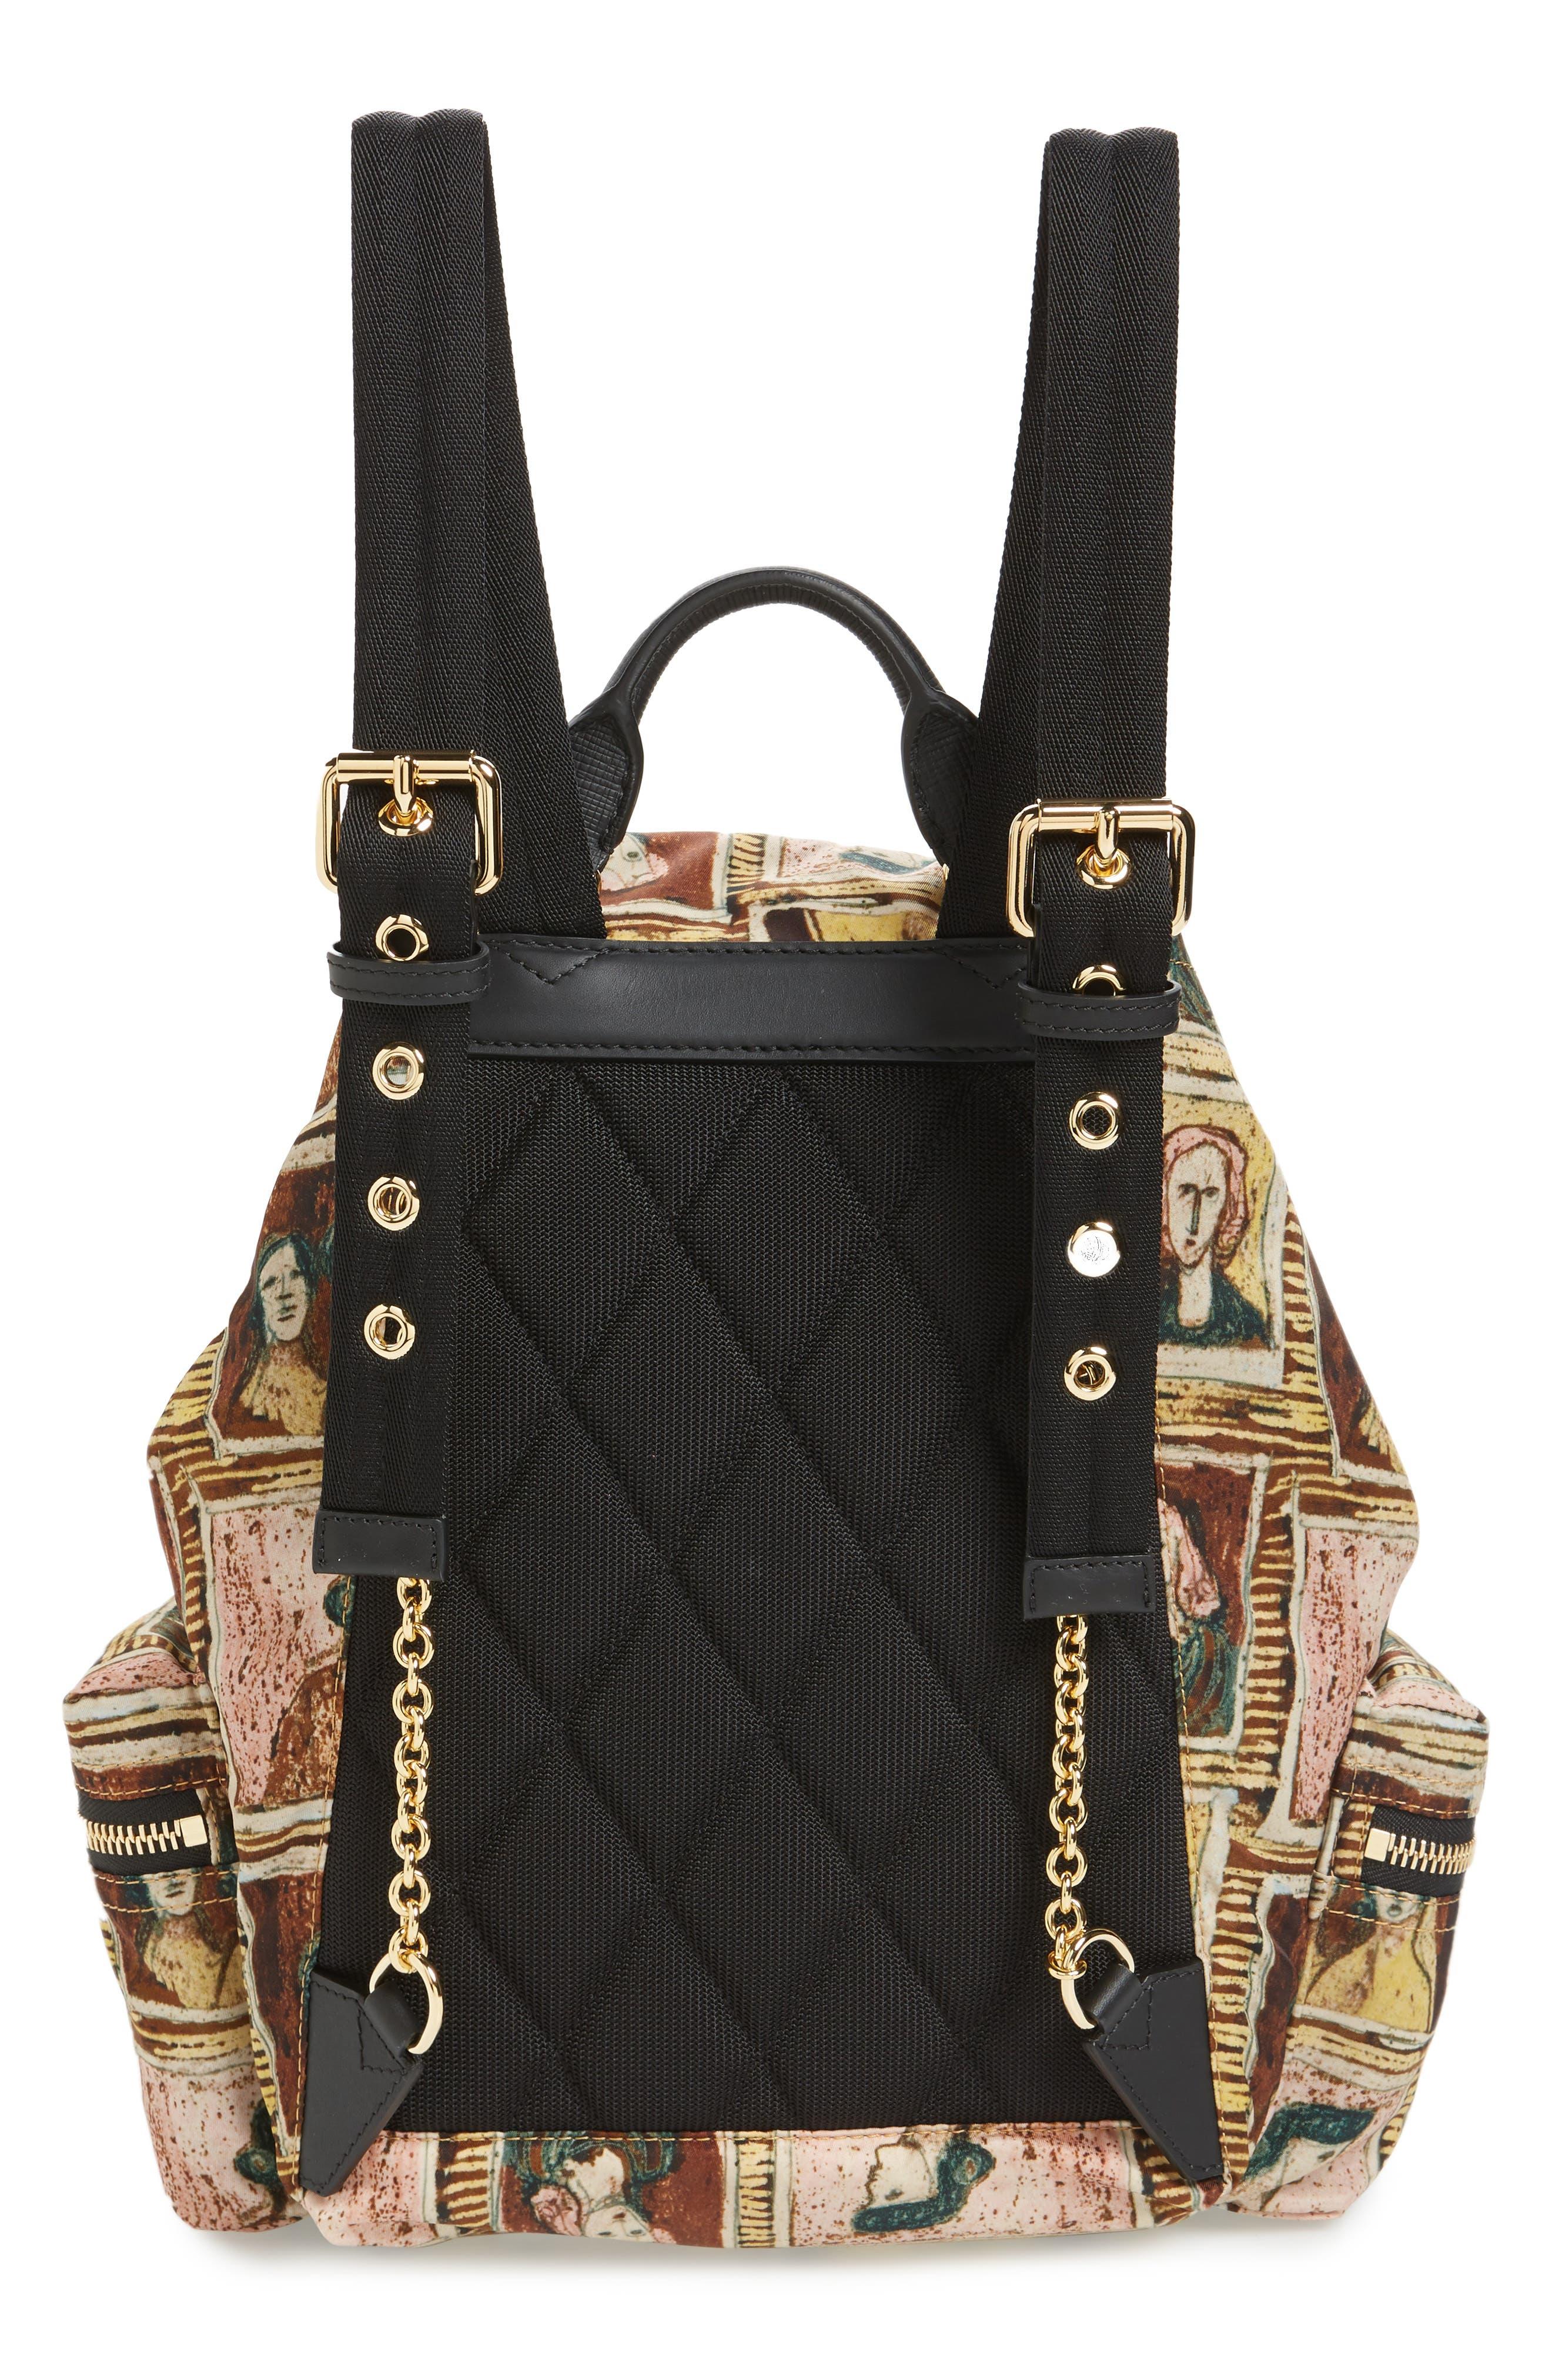 Medium Henrey Backpack,                             Alternate thumbnail 3, color,                             Umber Brown Multi